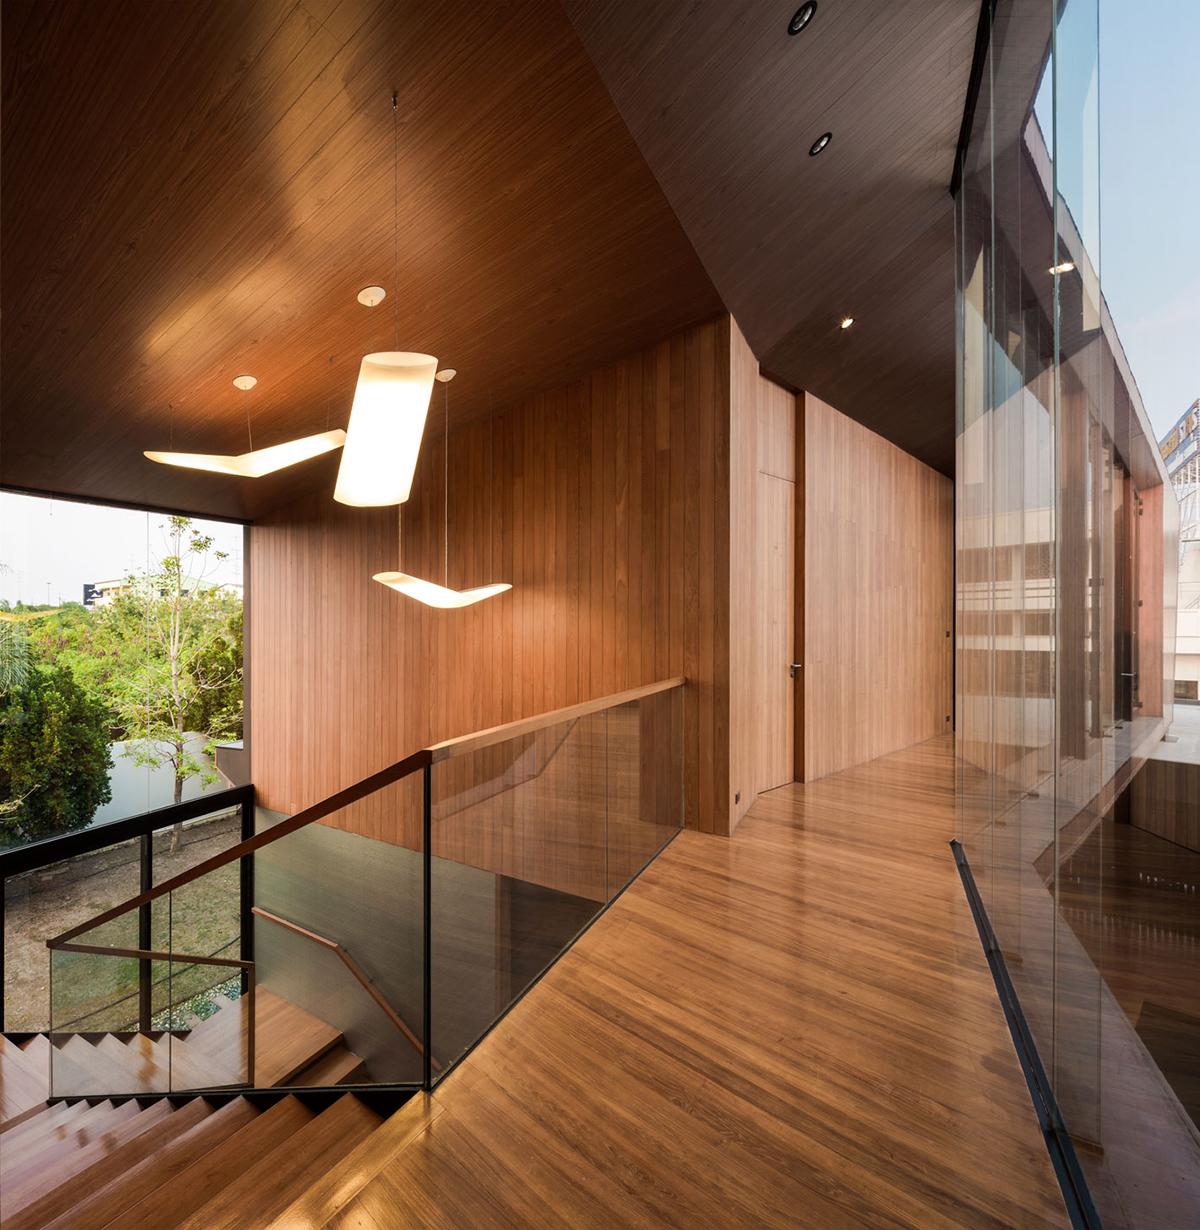 Residence R by Atom Design | KNSTRCT